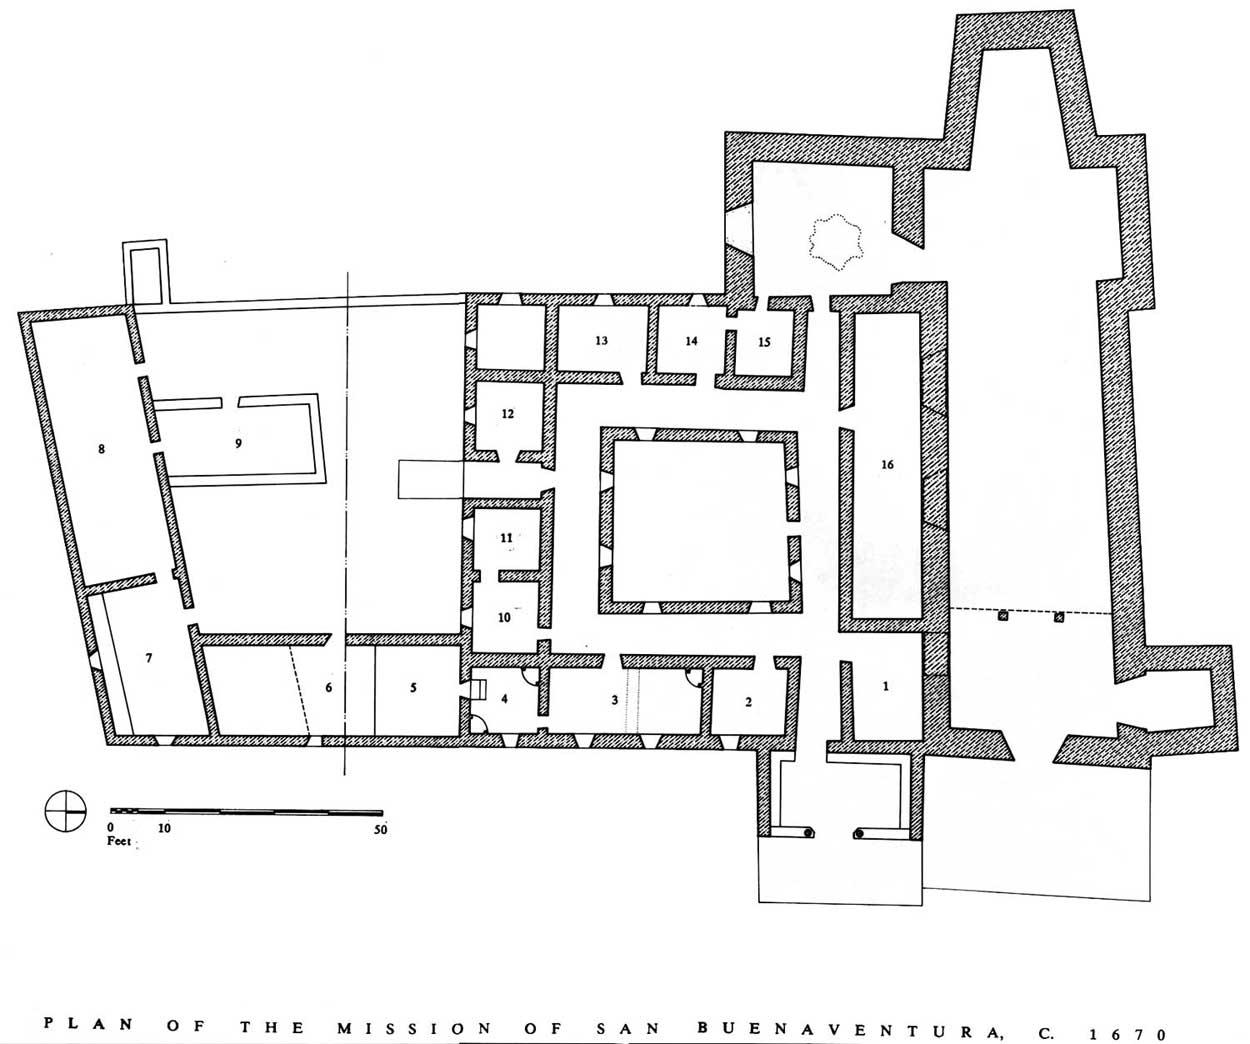 Salinas Pueblo Missions Nm Architectural History Table